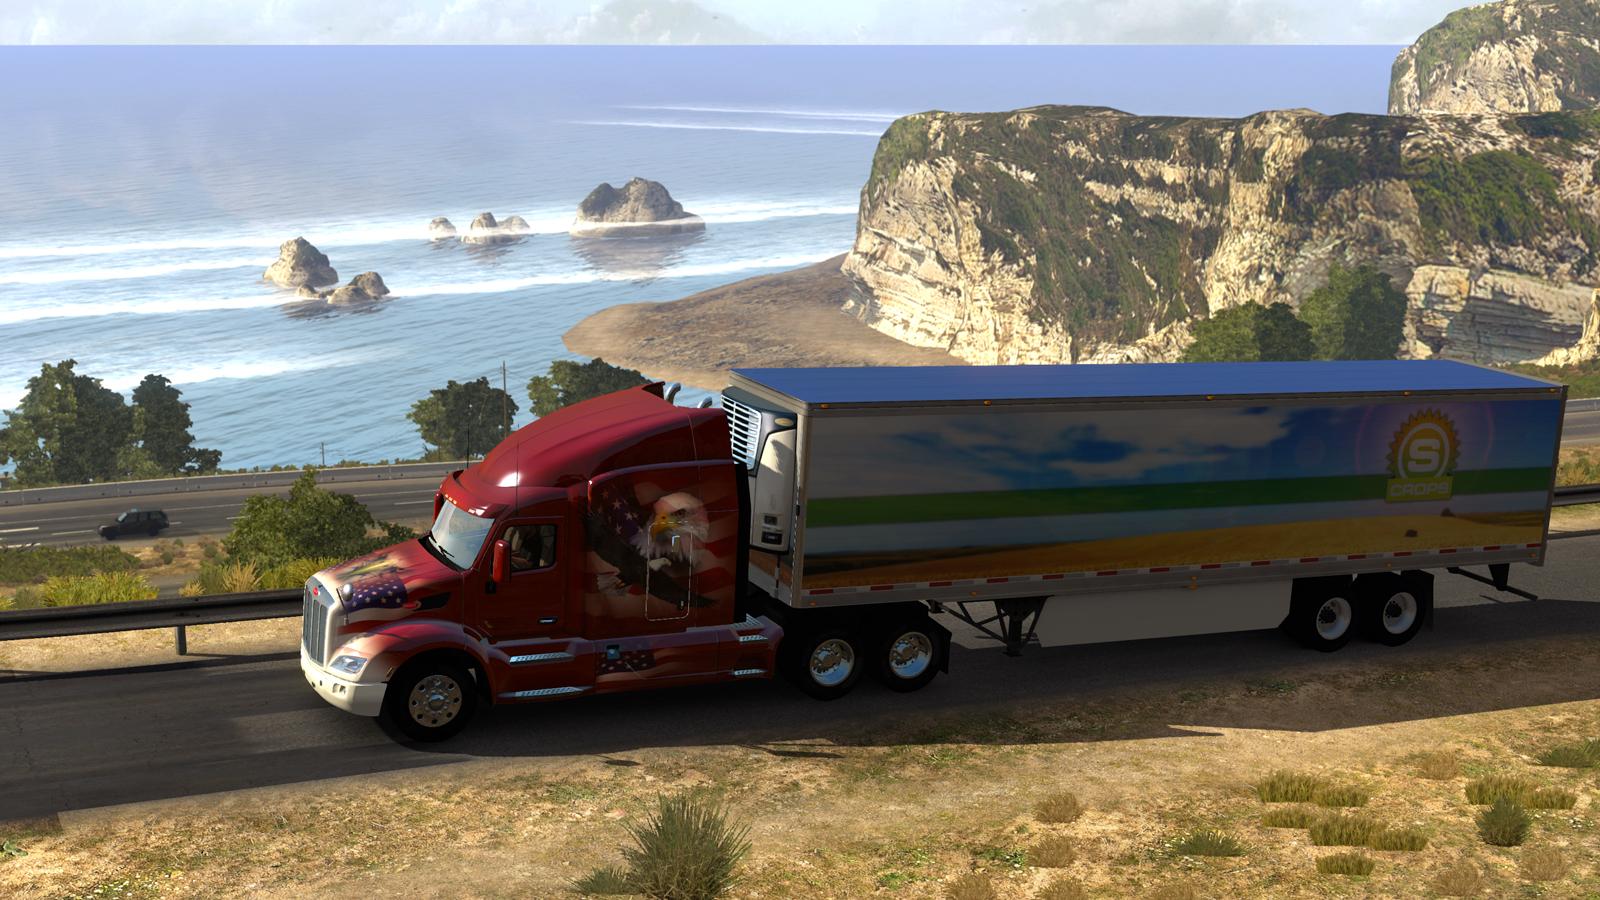 american truck simulator une vid o qui donne envie de conduire un camion pxlbbq. Black Bedroom Furniture Sets. Home Design Ideas